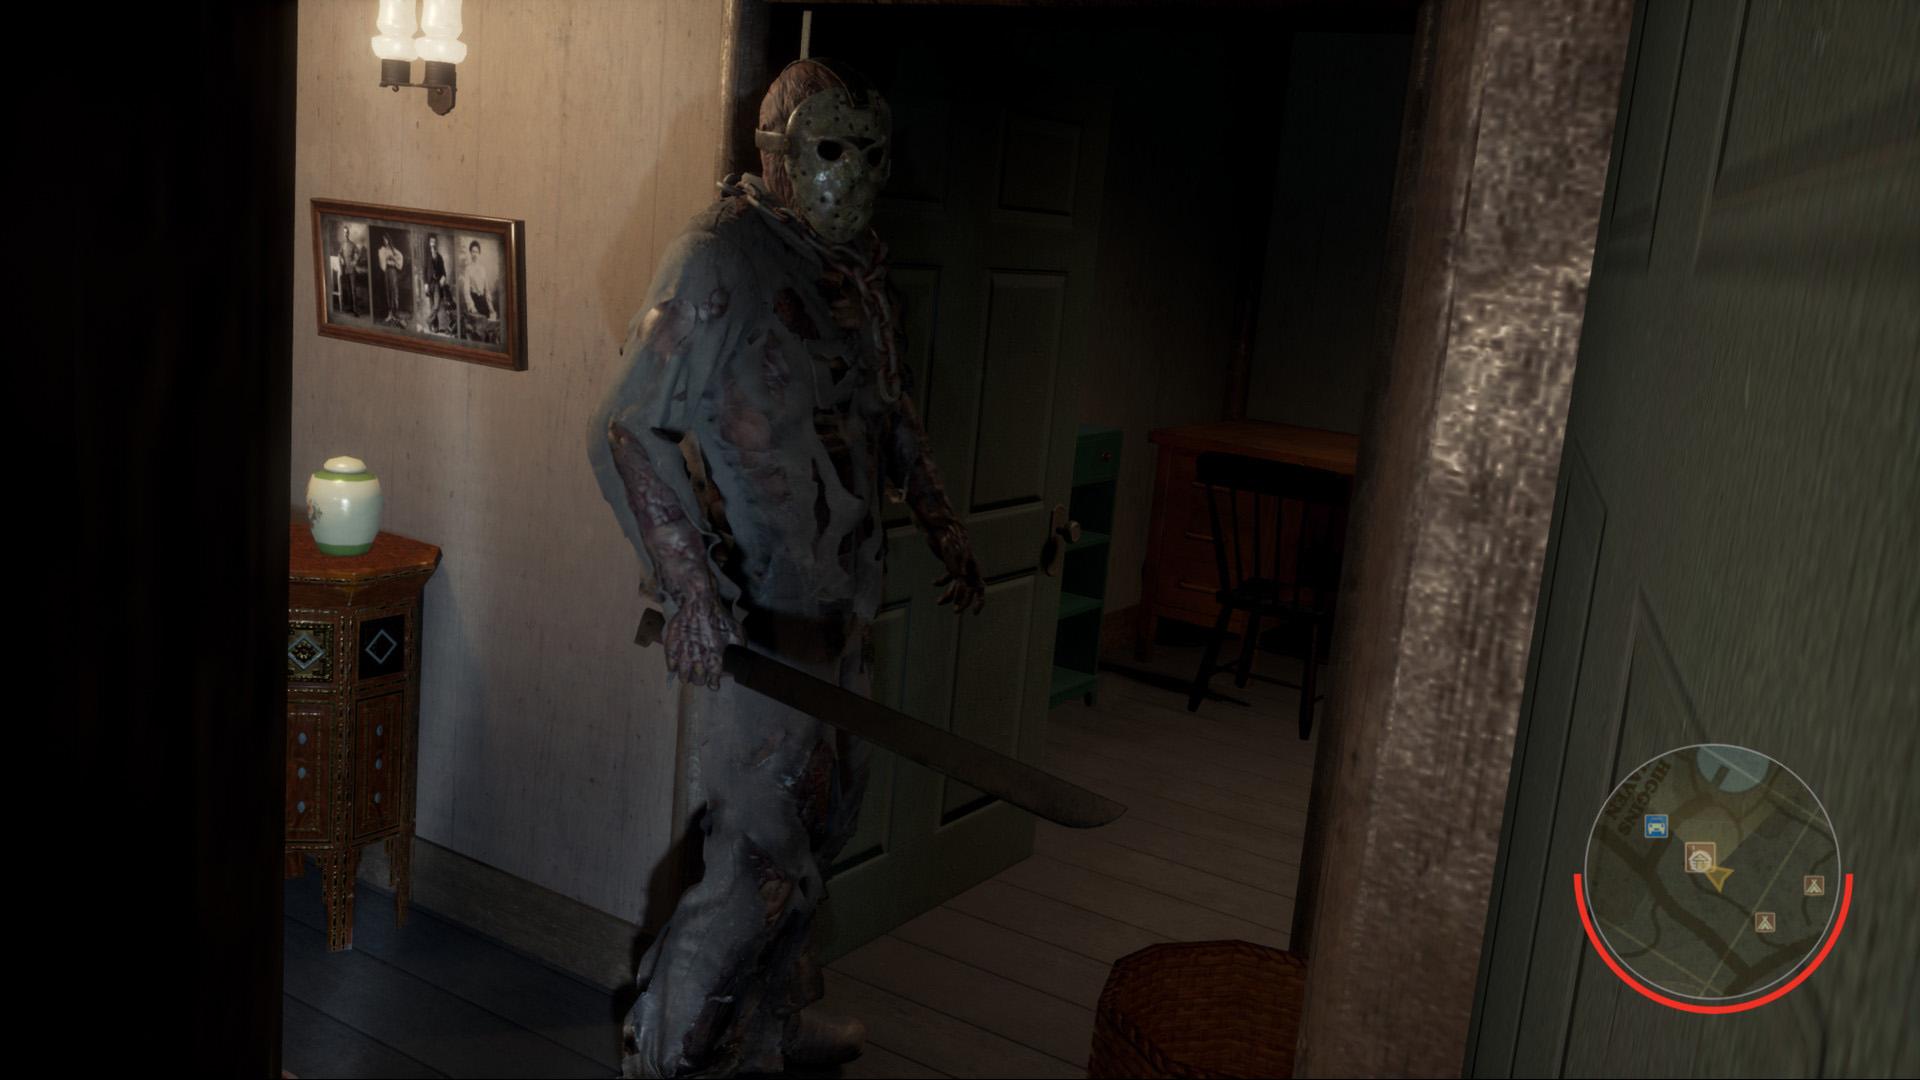 13号星期五:游戏版(Friday the 13th: The Game)插图2